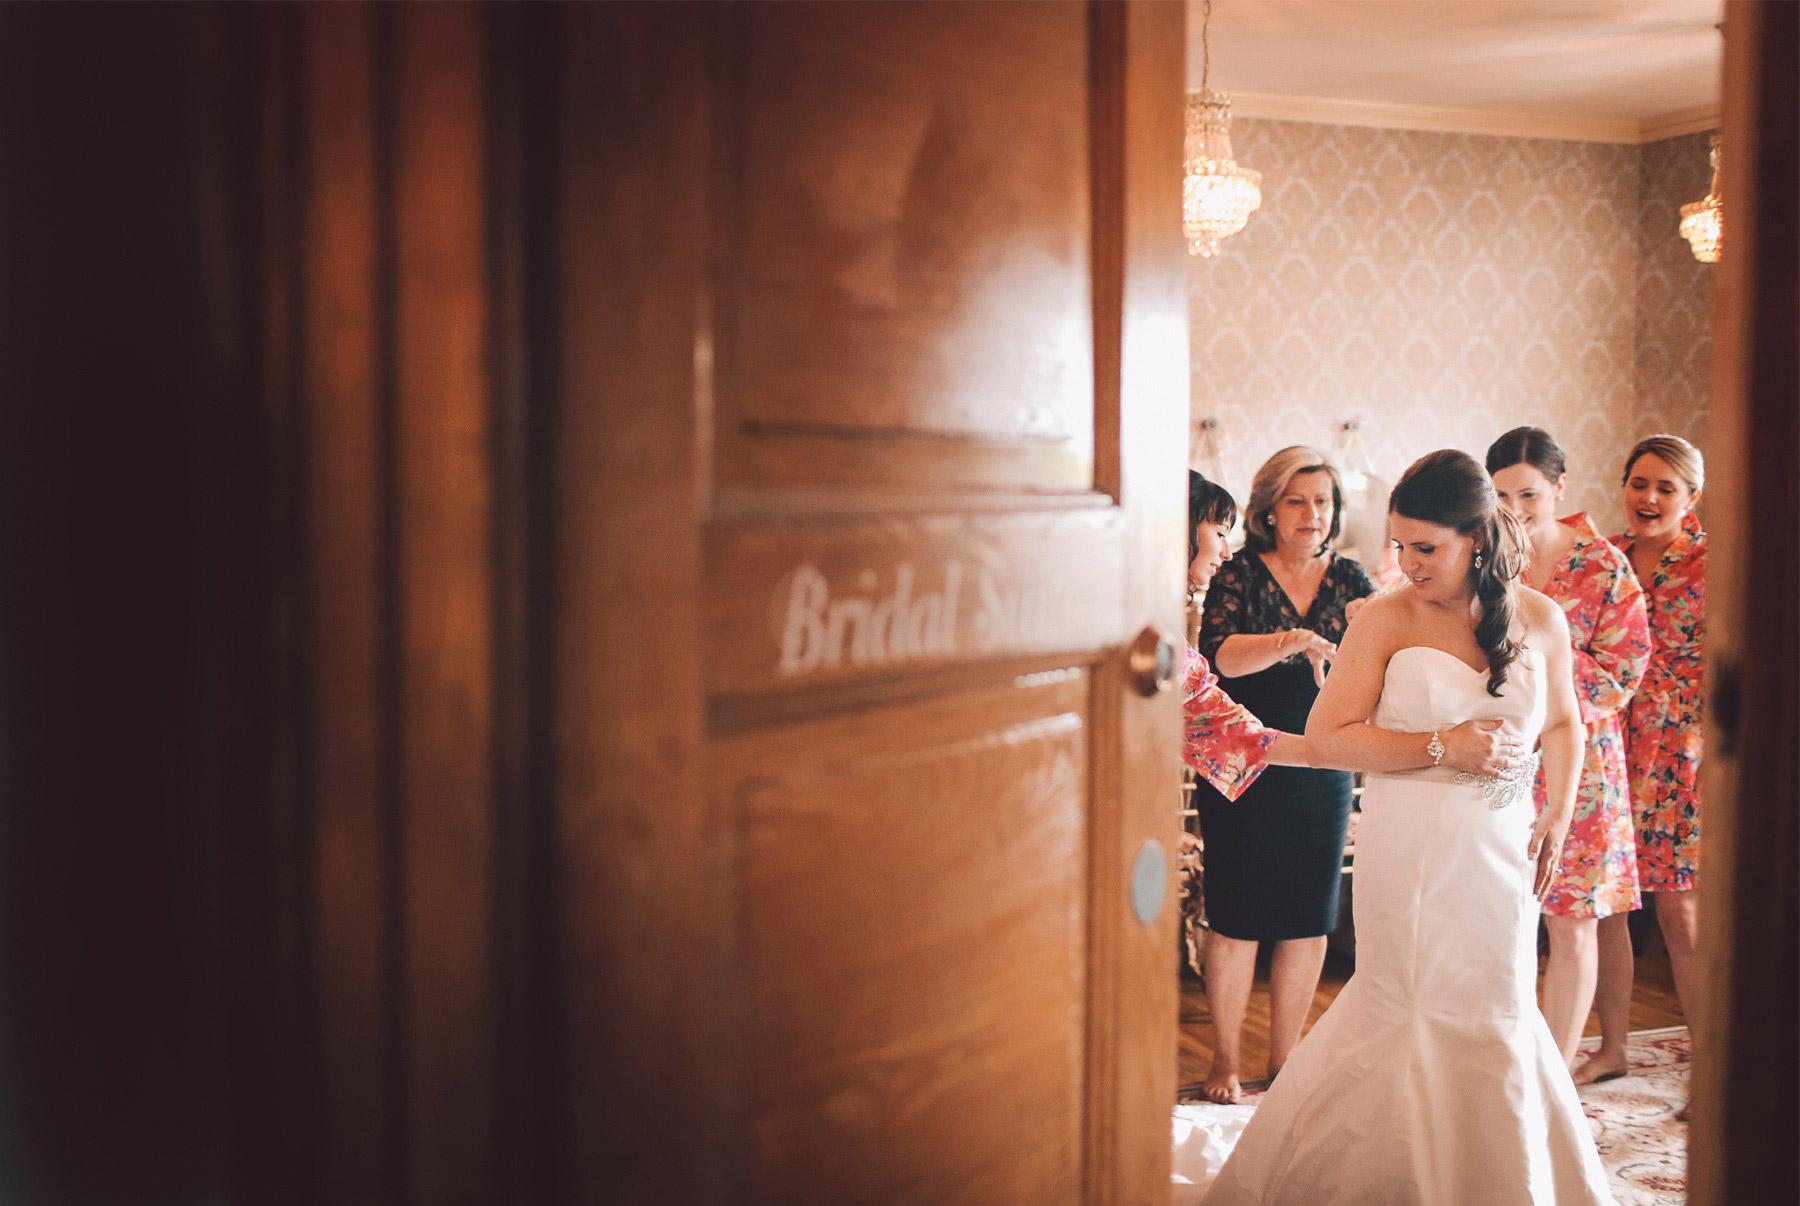 01-Minneapolis-Minnesota-Wedding-Photography-by-Vick-Photography-Semple-Mansion-Bridal-Suite-Nikki-and-Matt.jpg